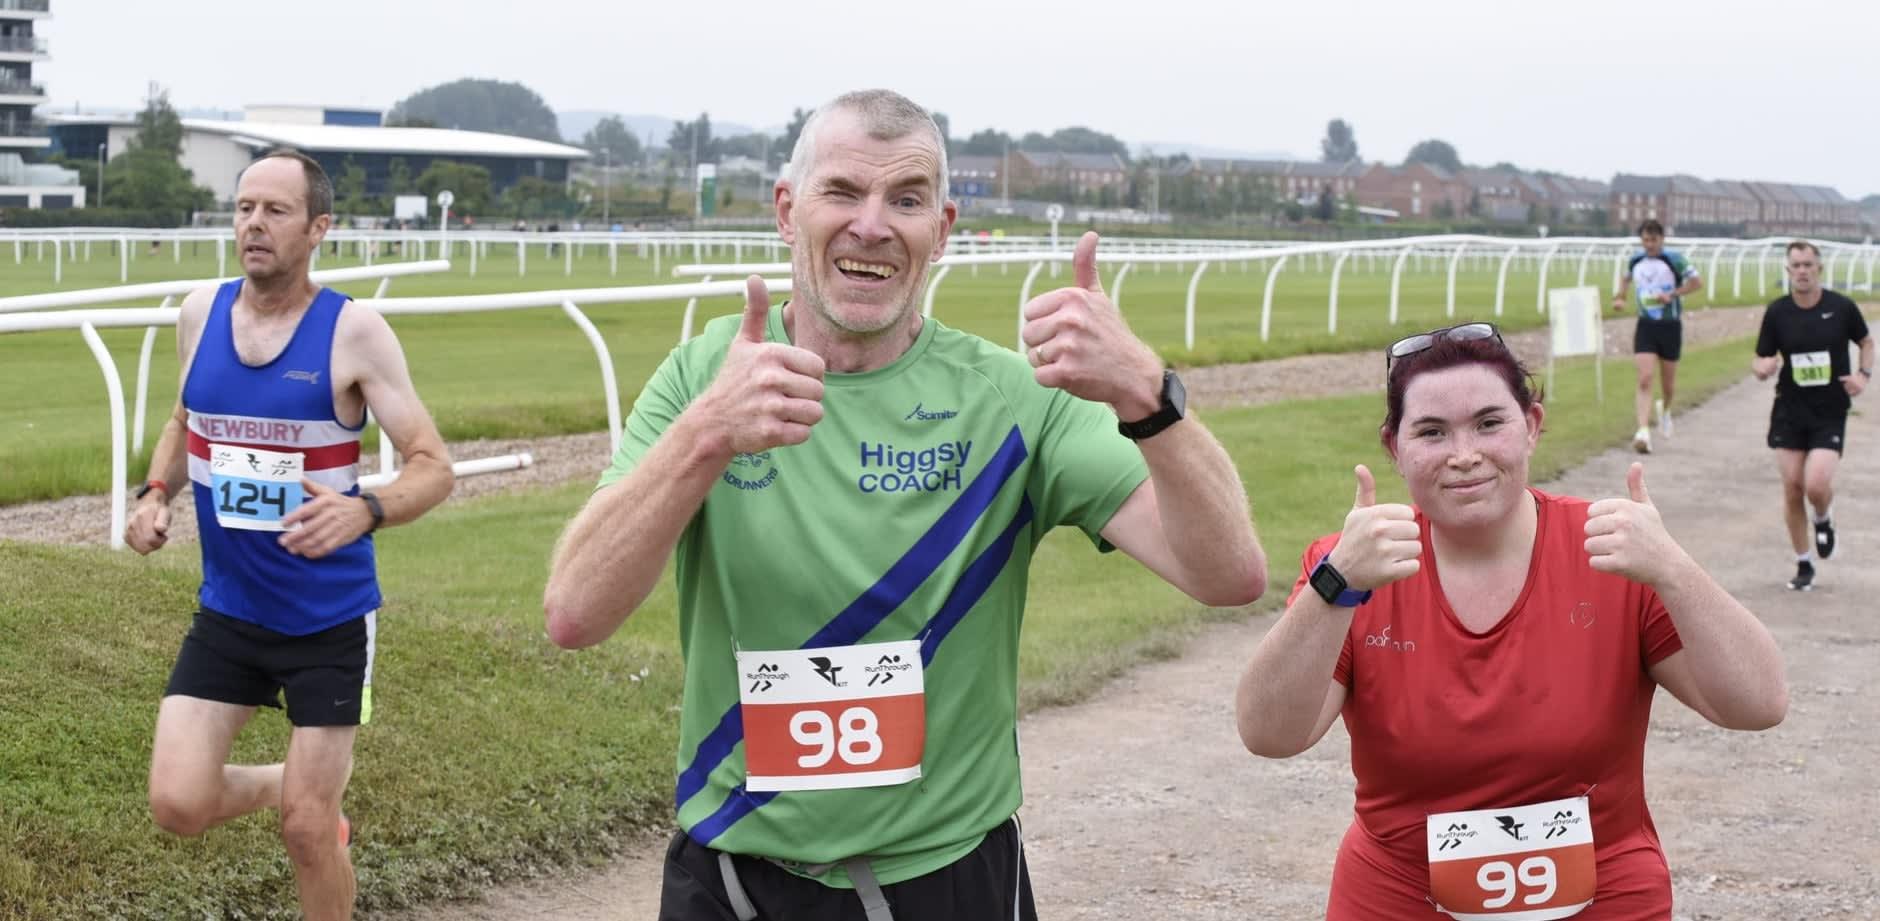 Run Aintree 5k, 10k & Half Marathon - October